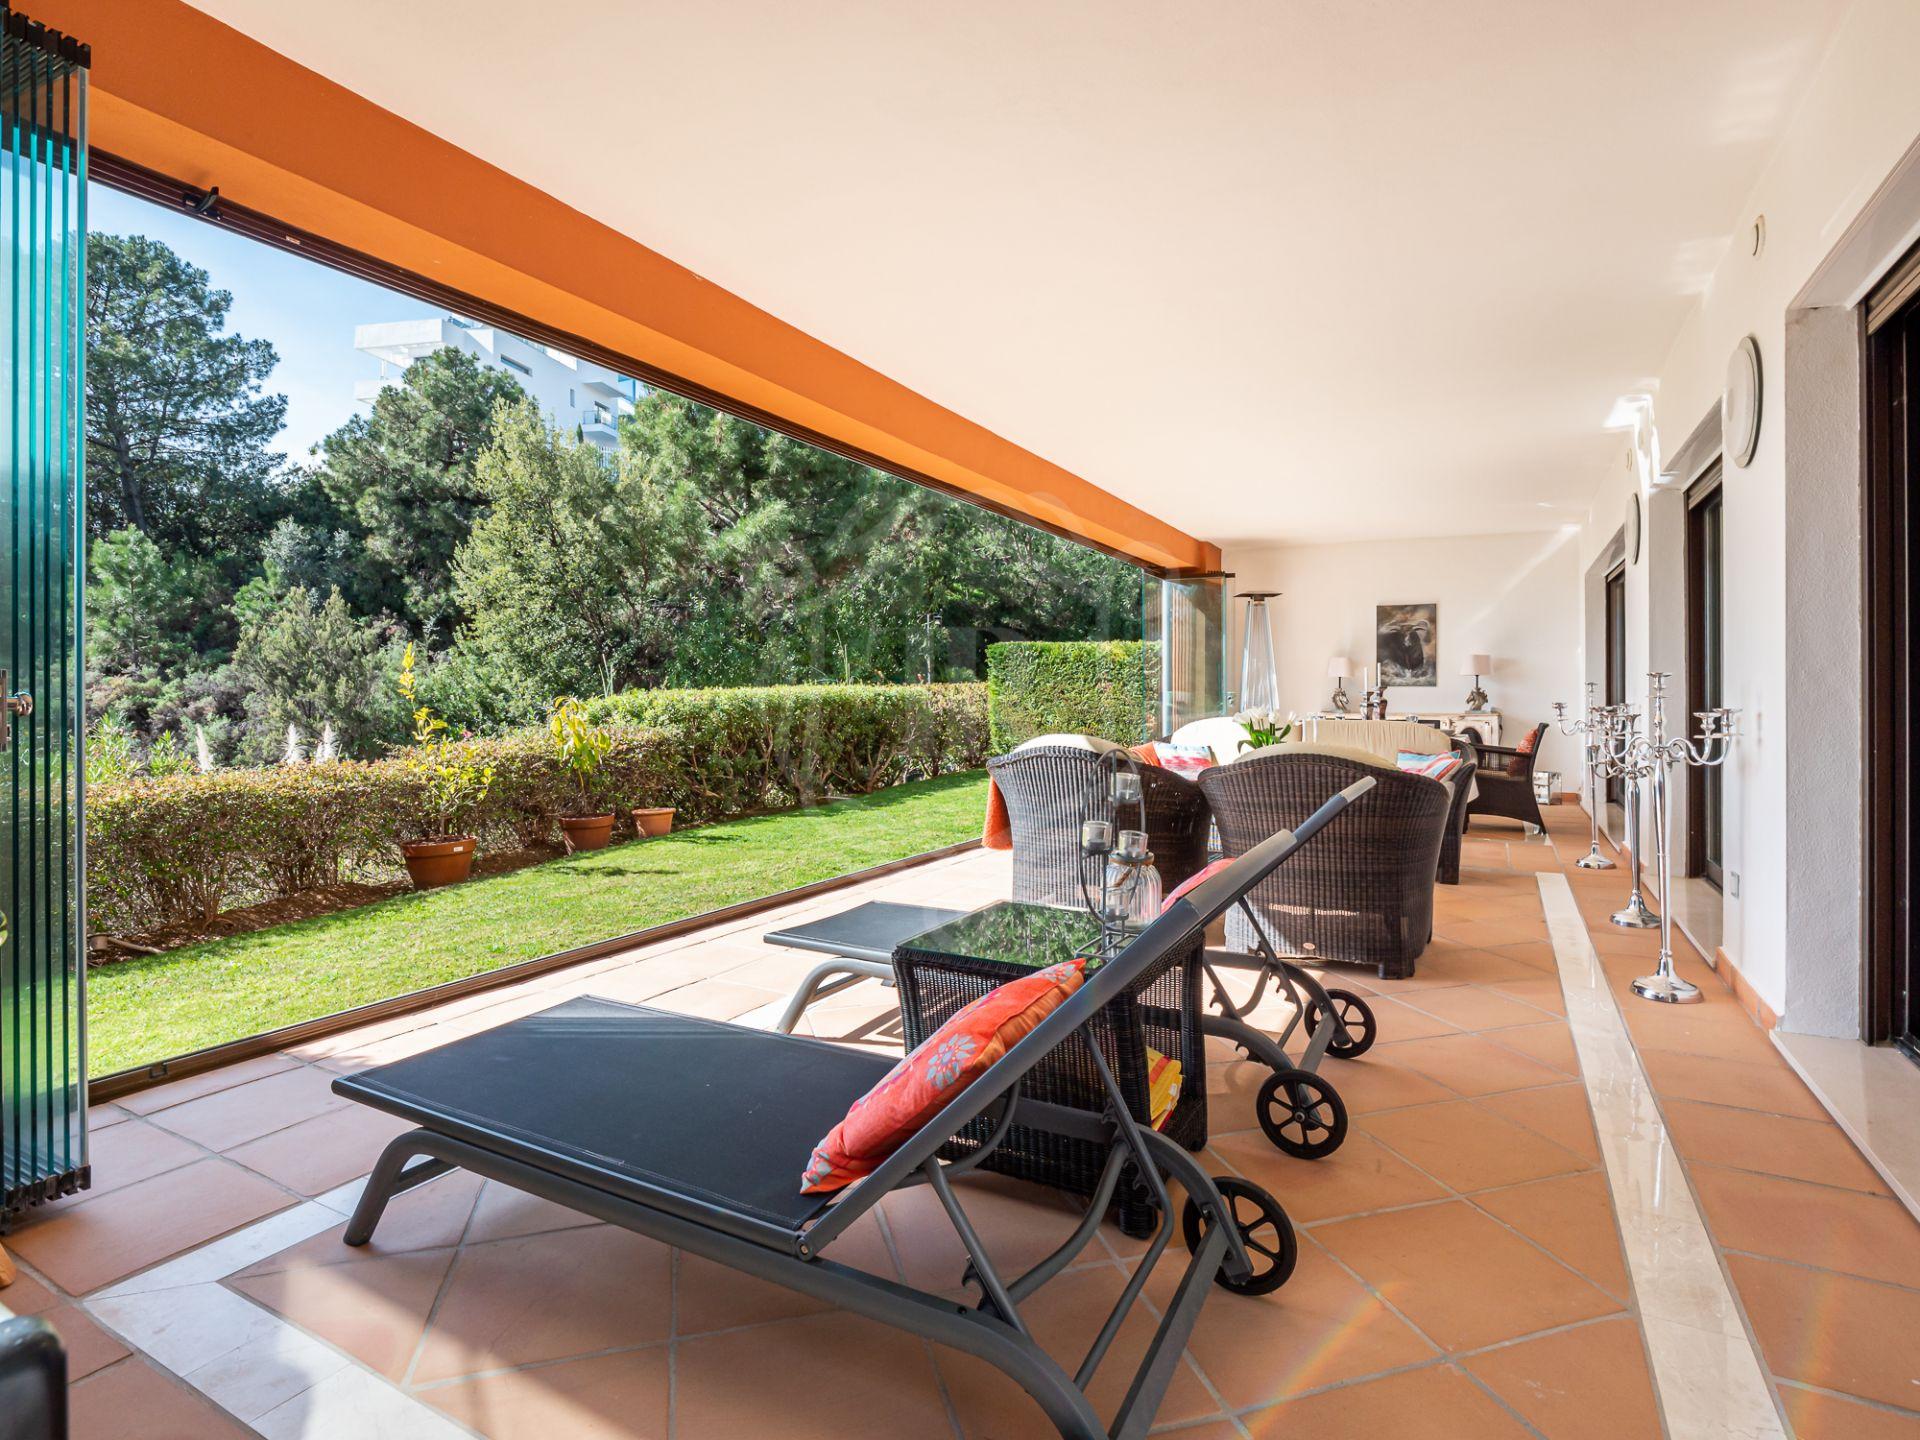 Ground Floor Apartment for sale in La Quinta, Benahavis